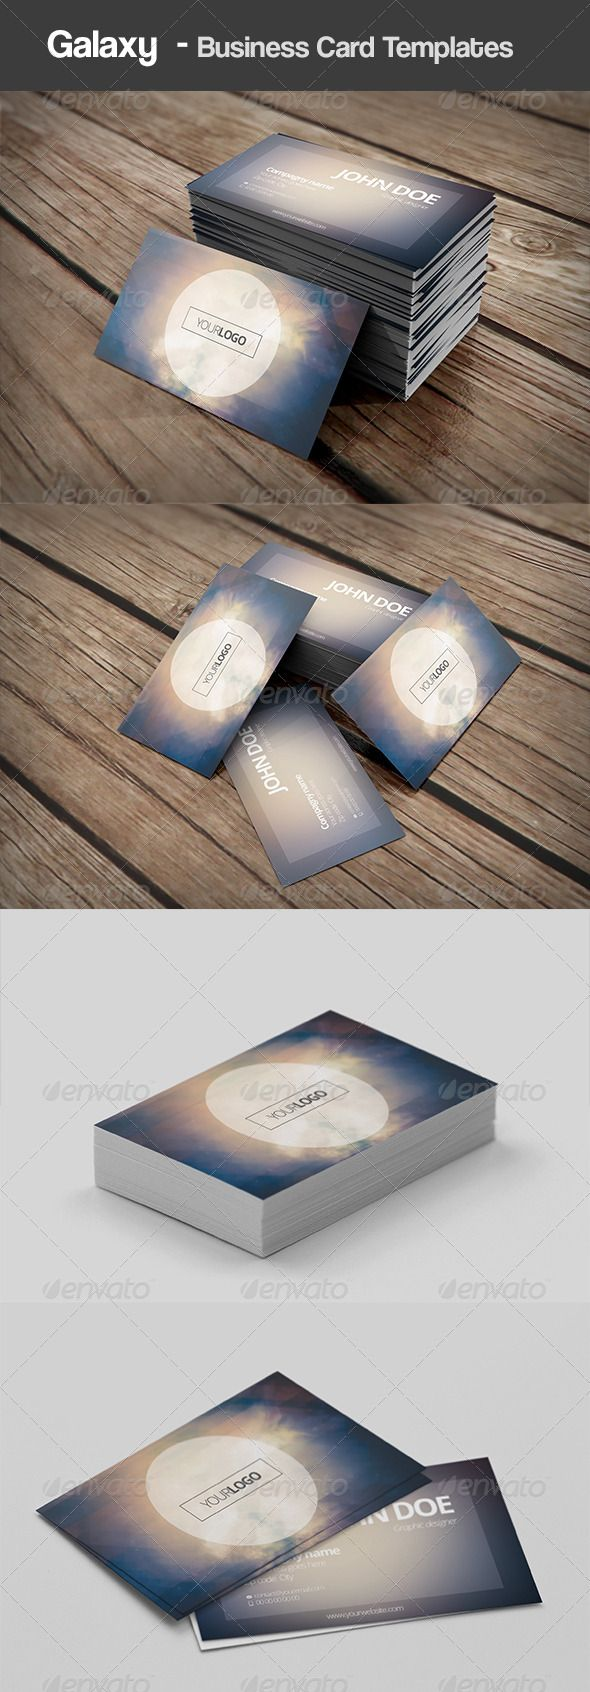 Galaxy Business Card Templates Minimalist Business Cards Modern Business Cards Vertical Business Cards